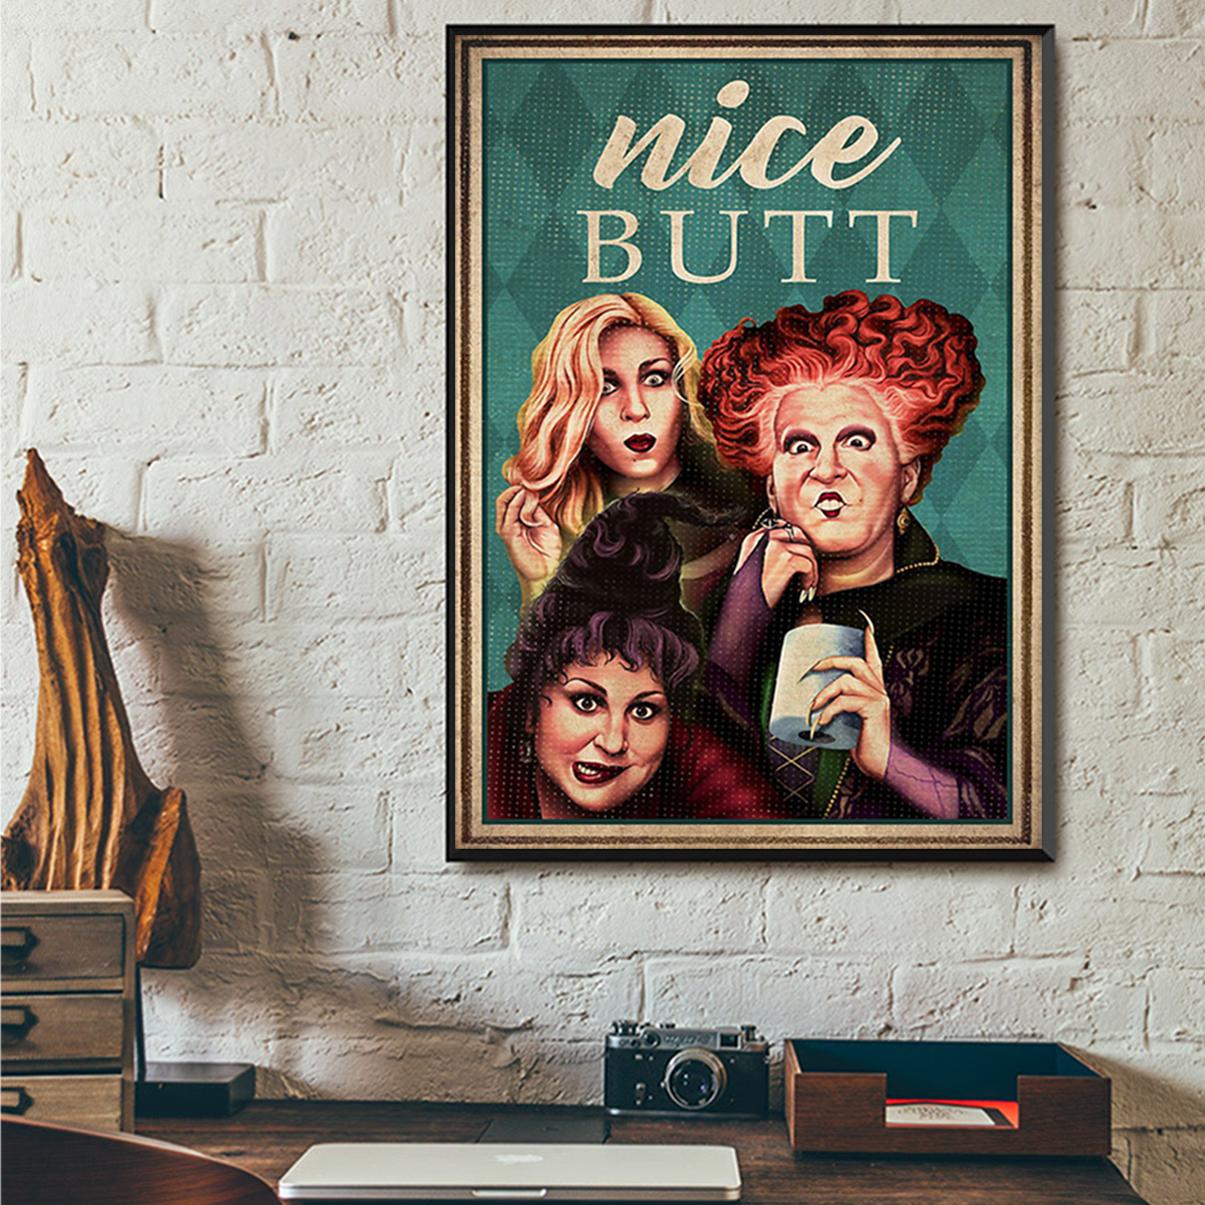 Hocus pocus nice butt poster A1